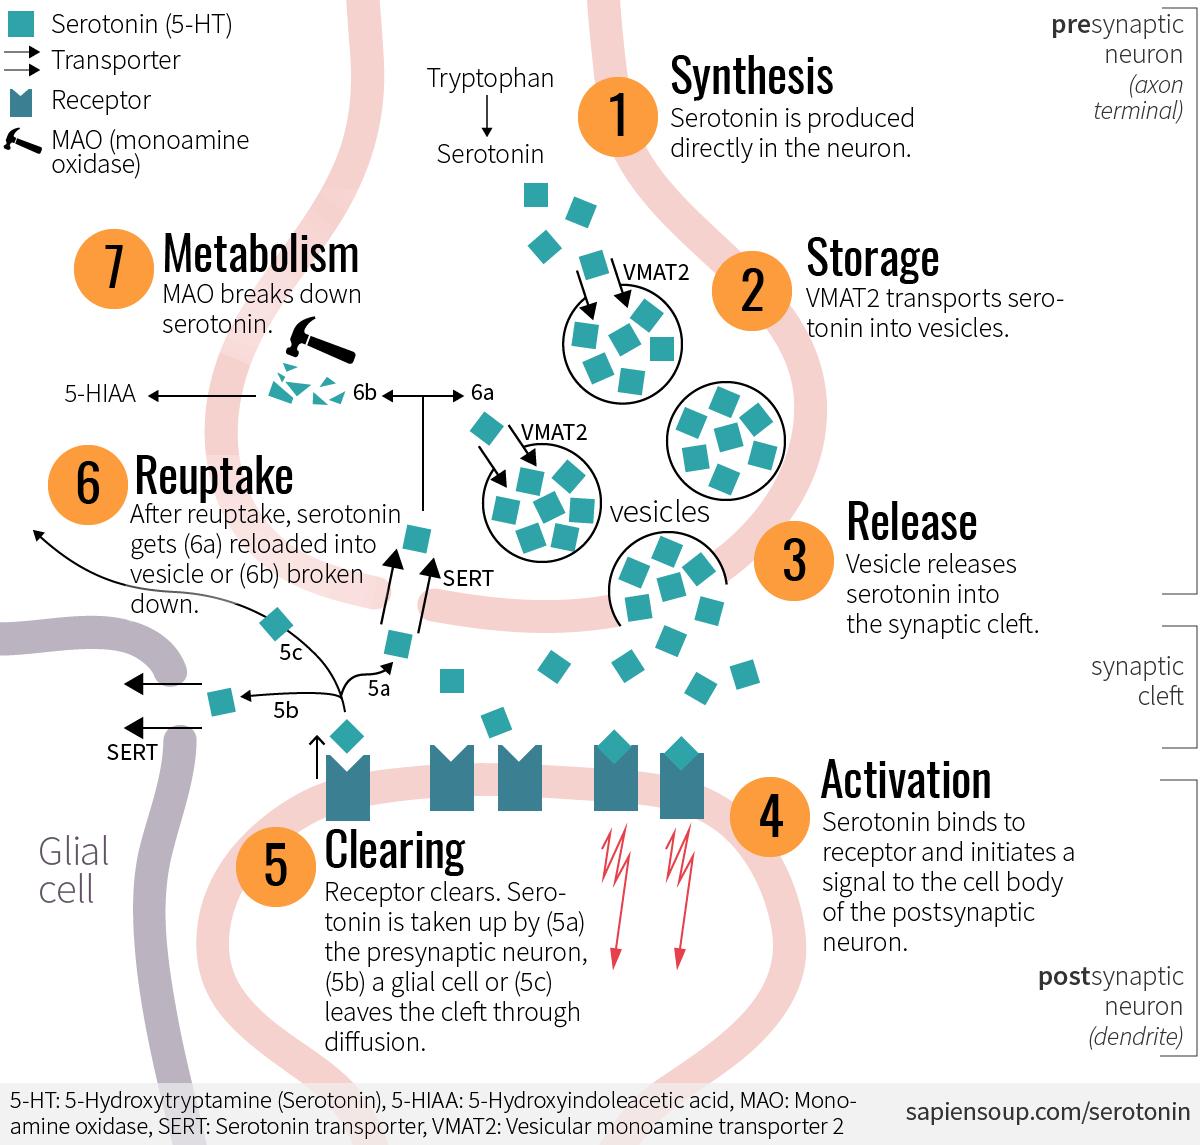 the cycle of serotonin